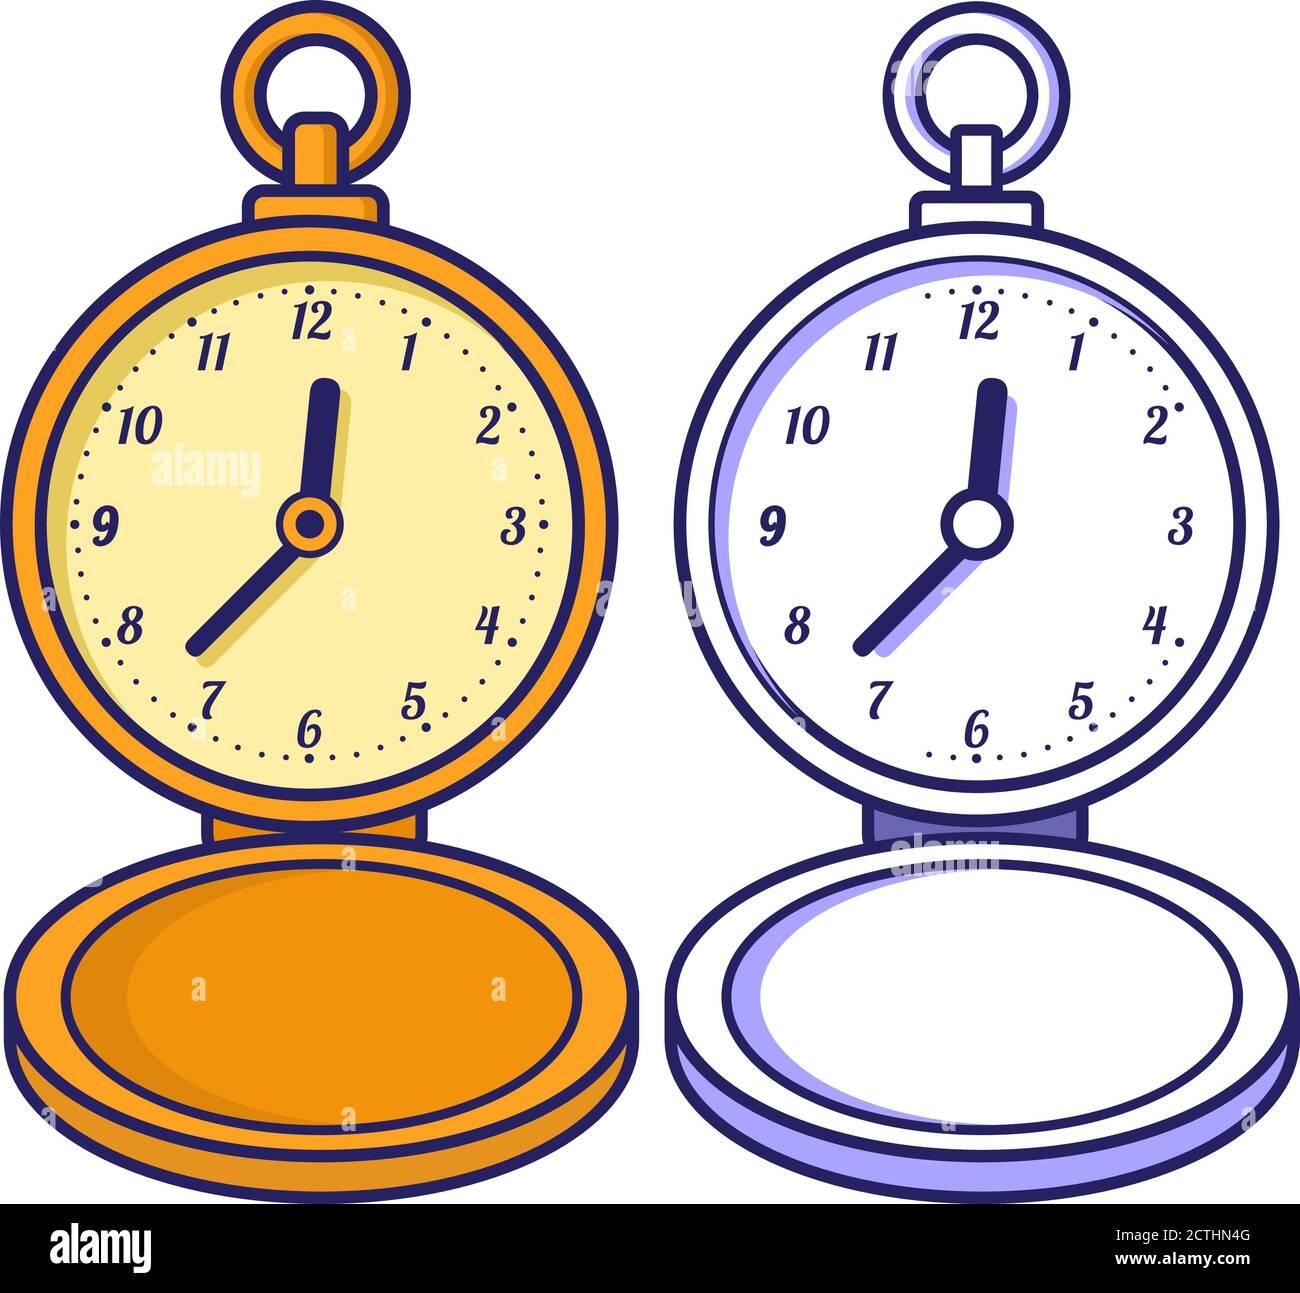 Reloj De Bolsillo Libro Para Colorear Para Niños Fideos Contorneados Imagen Vector De Stock Alamy